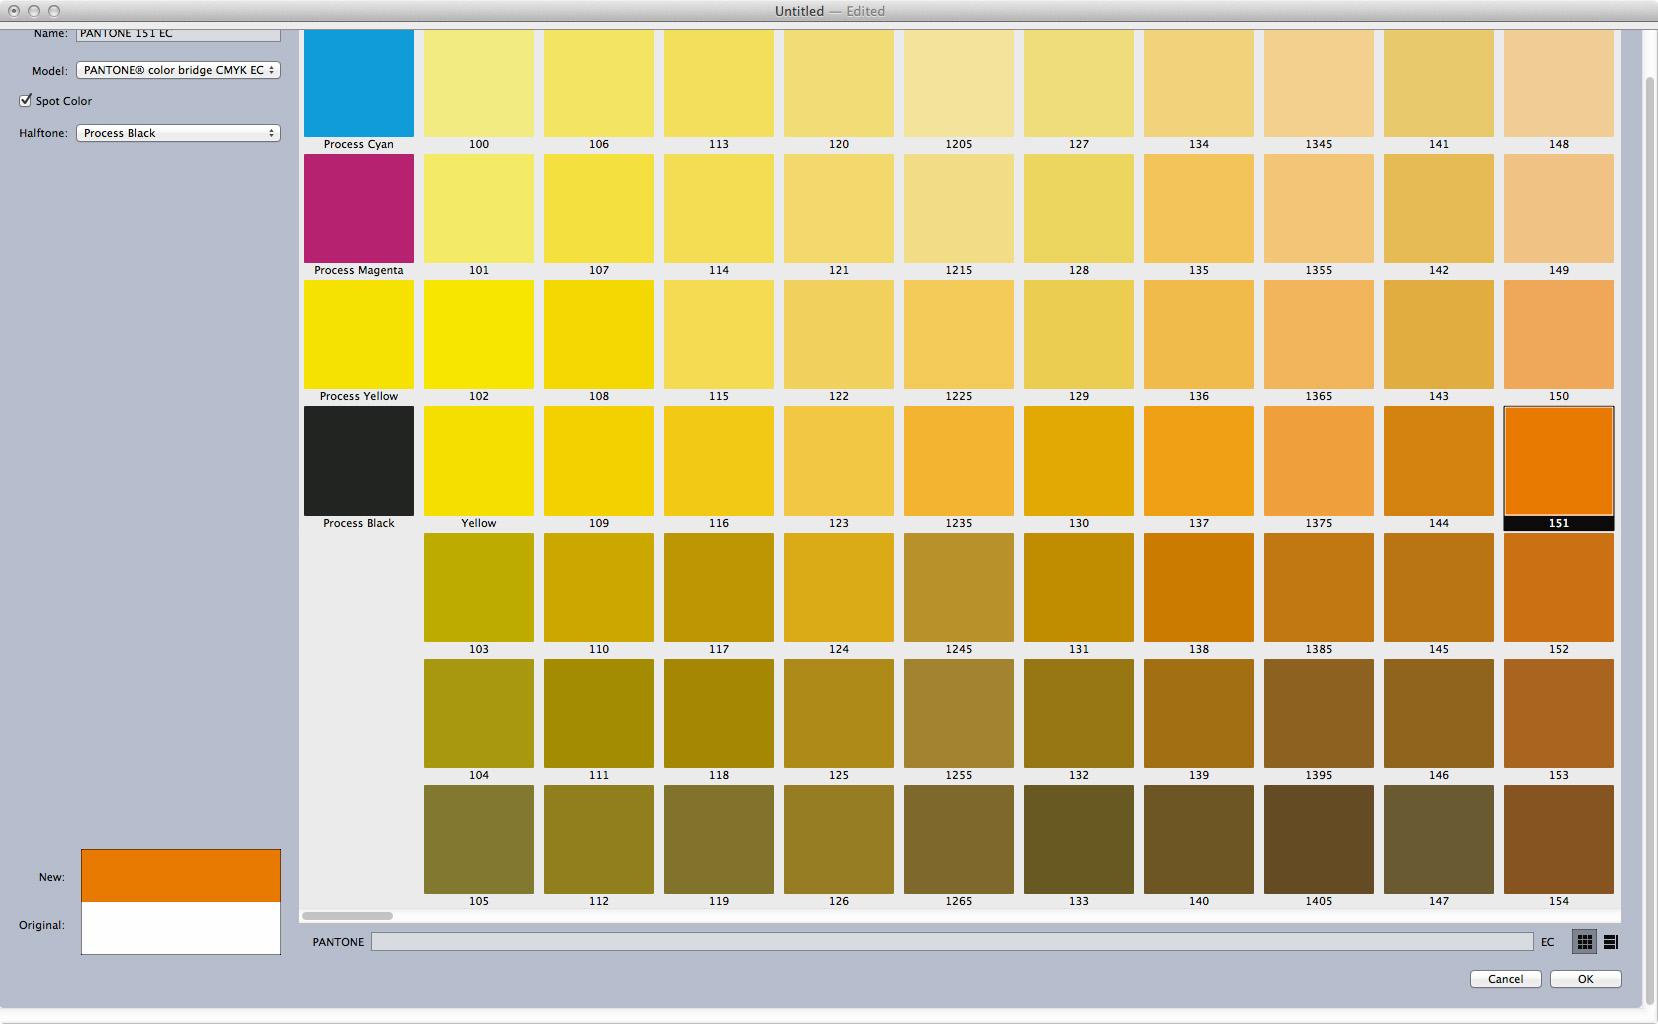 pantone farbabstimmung f r tintensets mit erweitertem farbraum. Black Bedroom Furniture Sets. Home Design Ideas